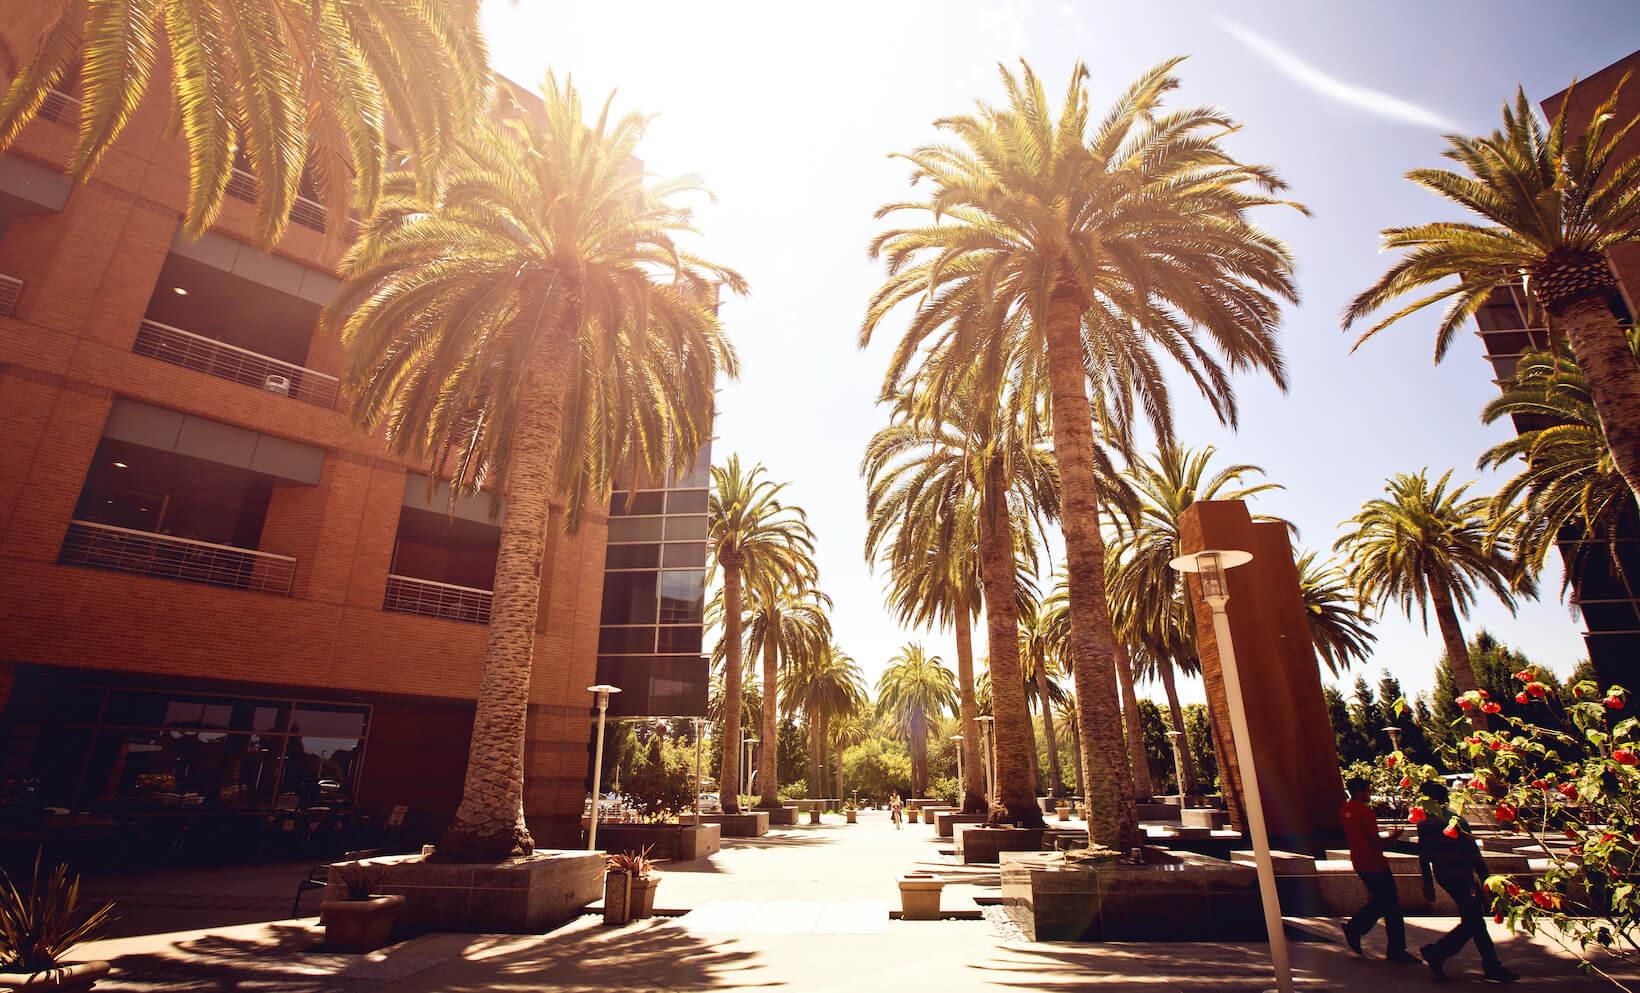 Silicon Valley m&a advisory, m&a advice, Tech companies